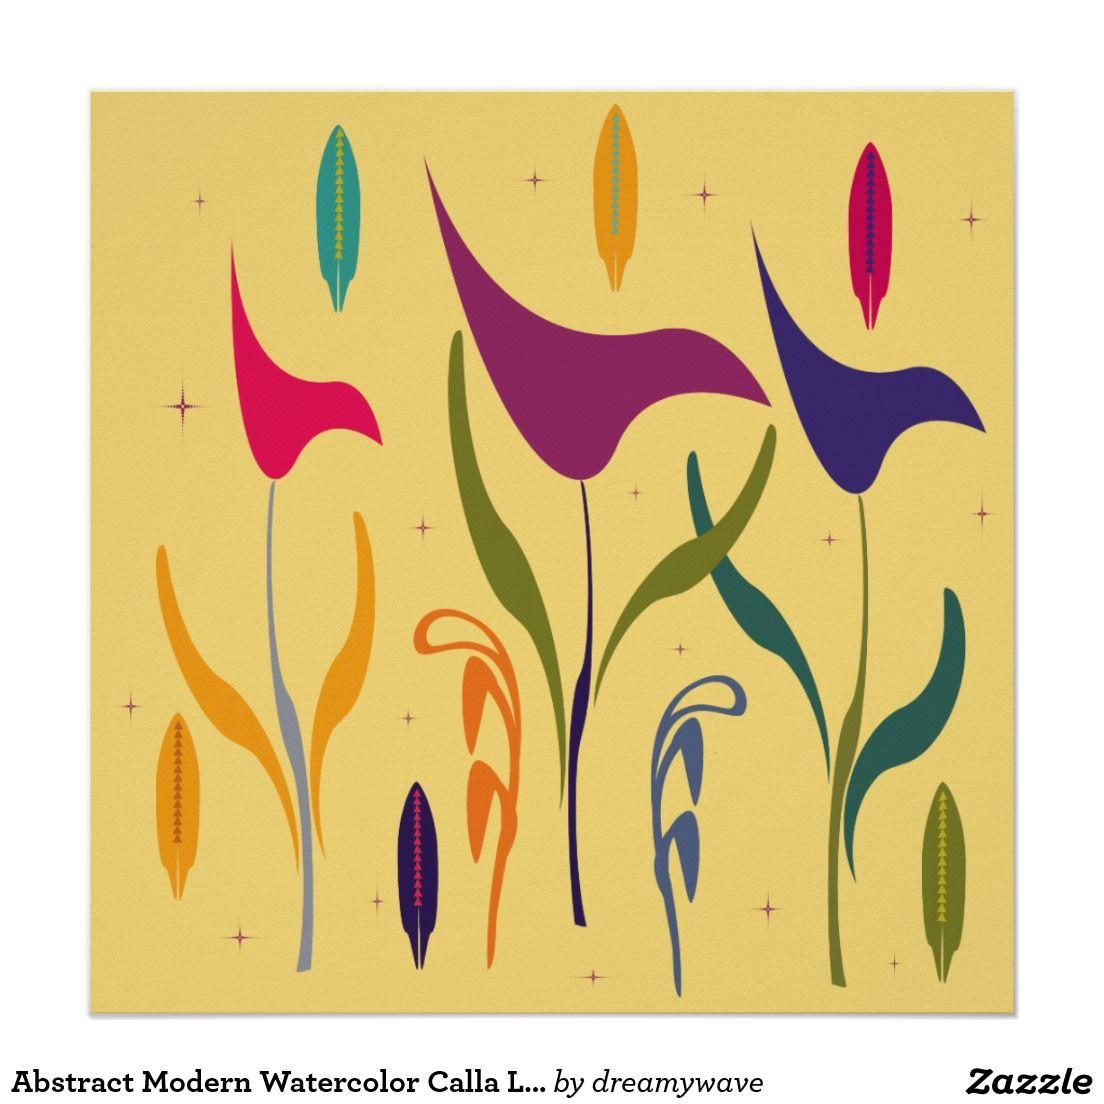 Abstract Modern Watercolor Calla Lily Impression Poster | Calla ...